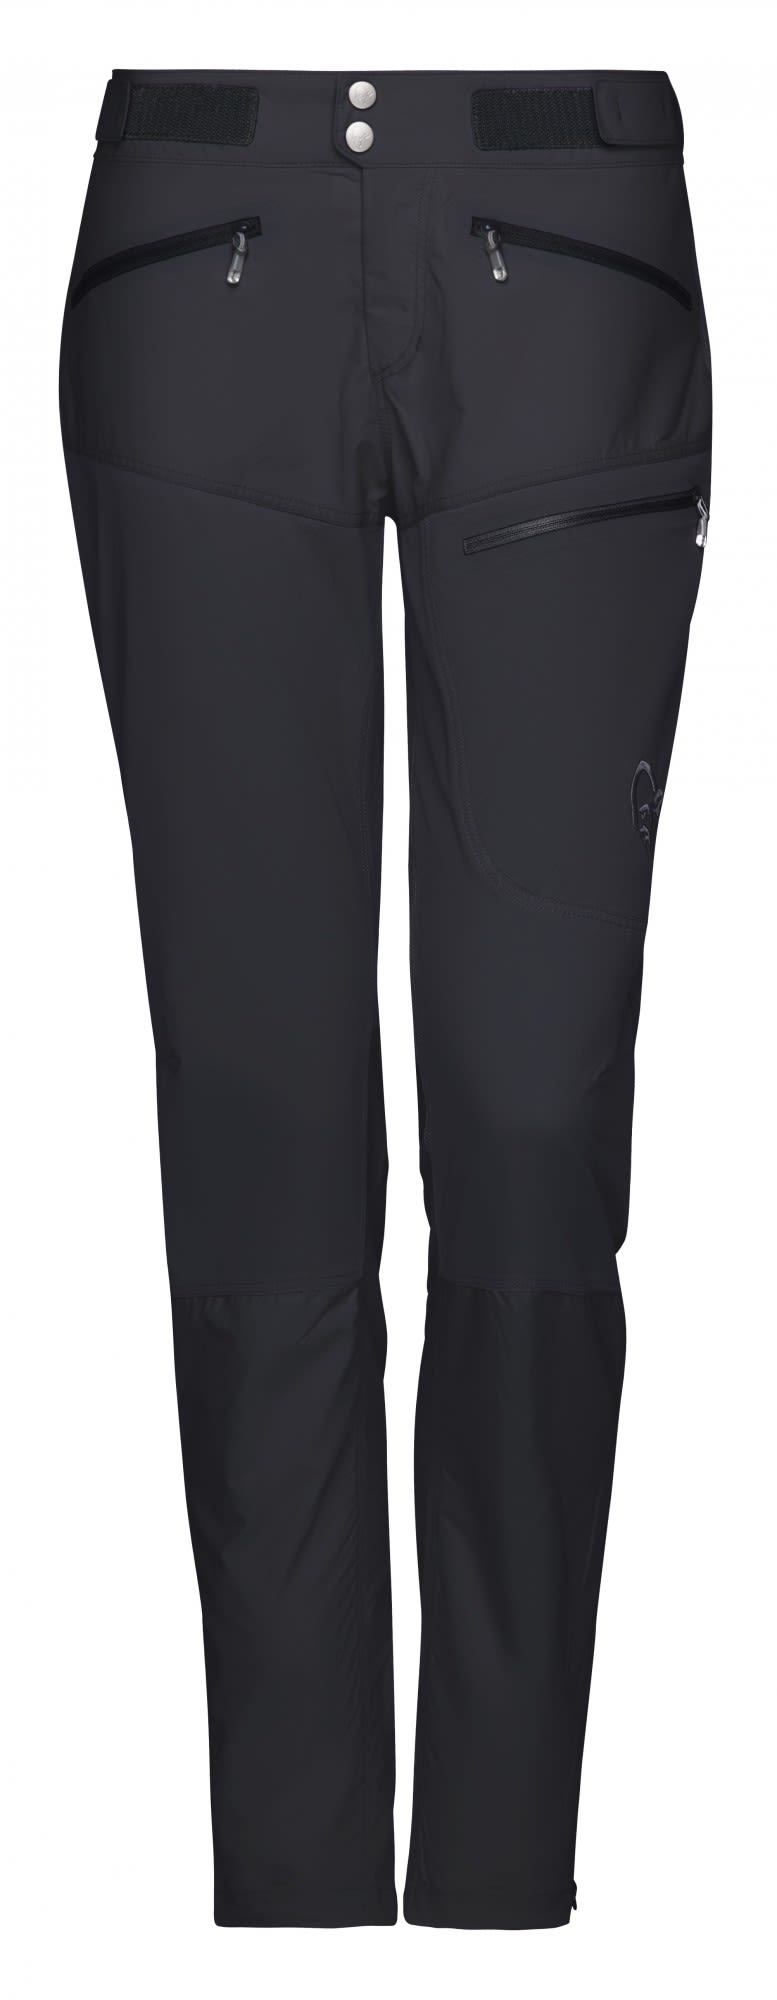 Norrona Bitihorn Lightweight Pants Schwarz, Female Hose, XS